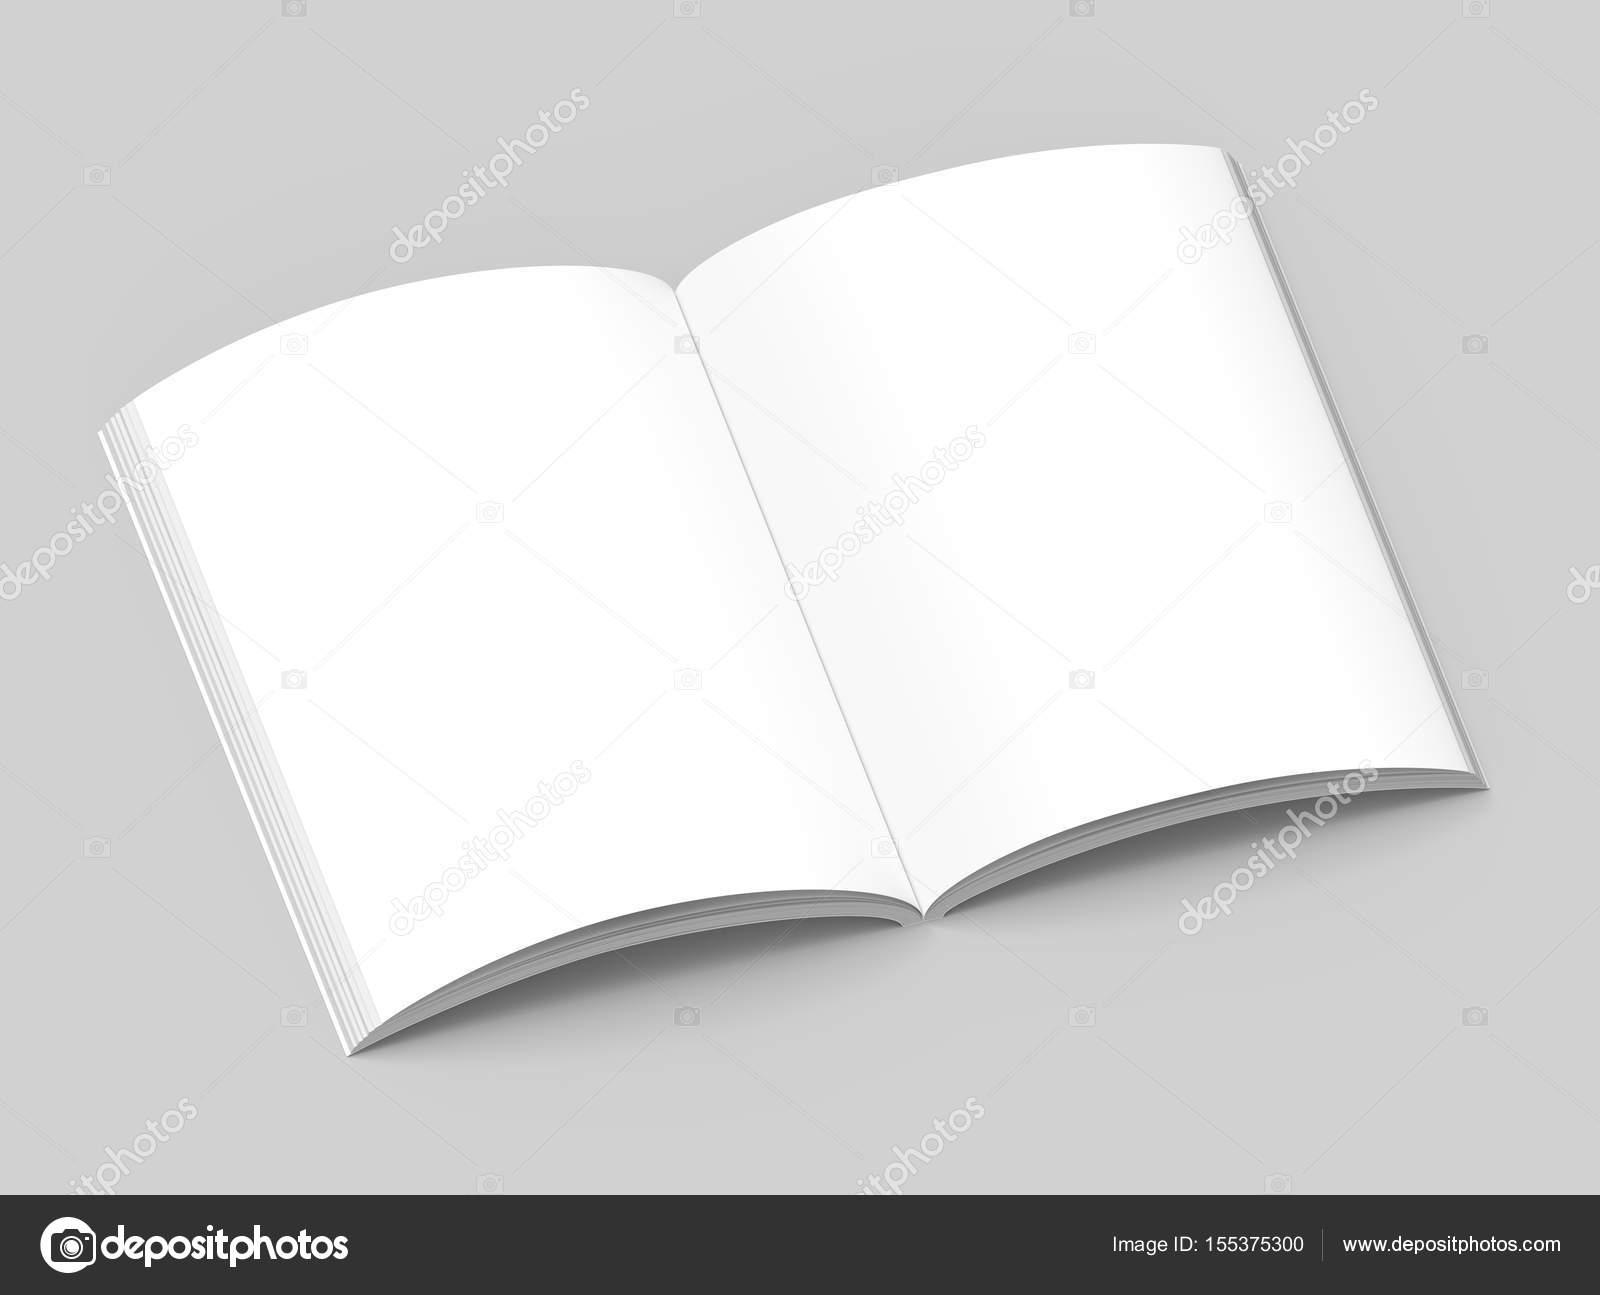 Leere Hardcover-Buch-Vorlage — Stockfoto © kchungtw #155375300